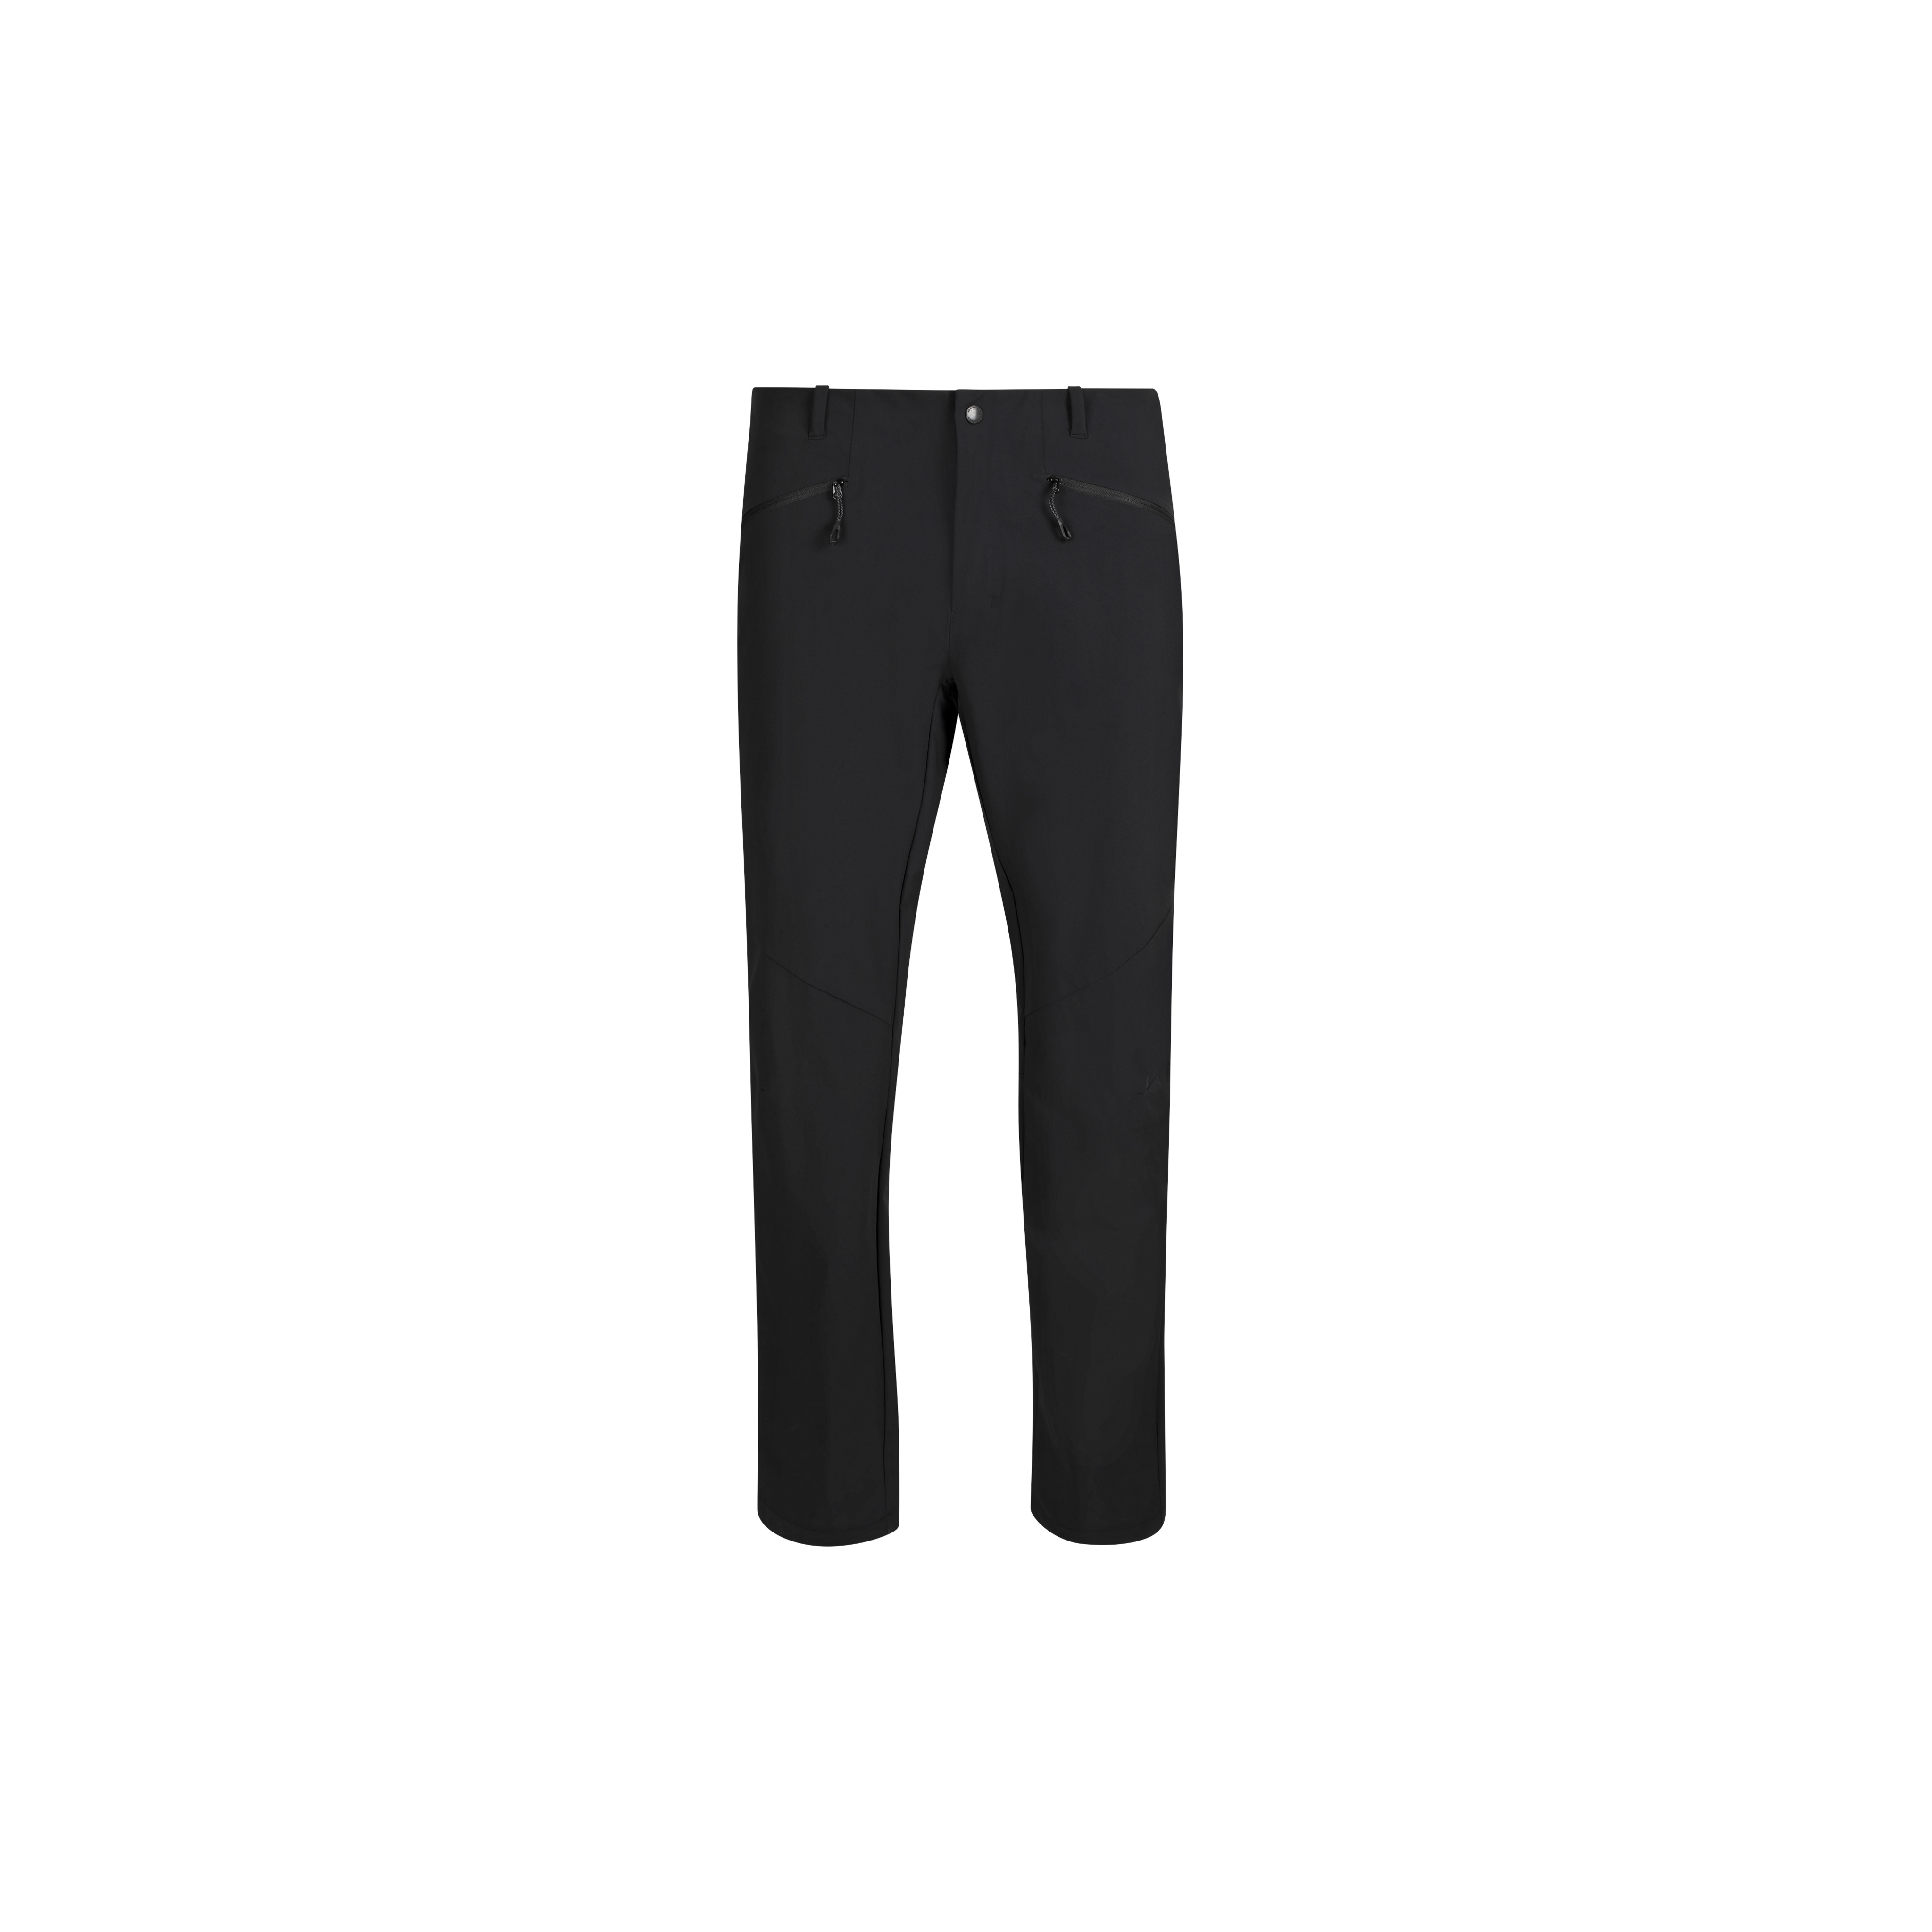 Macun SO Pants Men - black, normal, UK 28 thumbnail